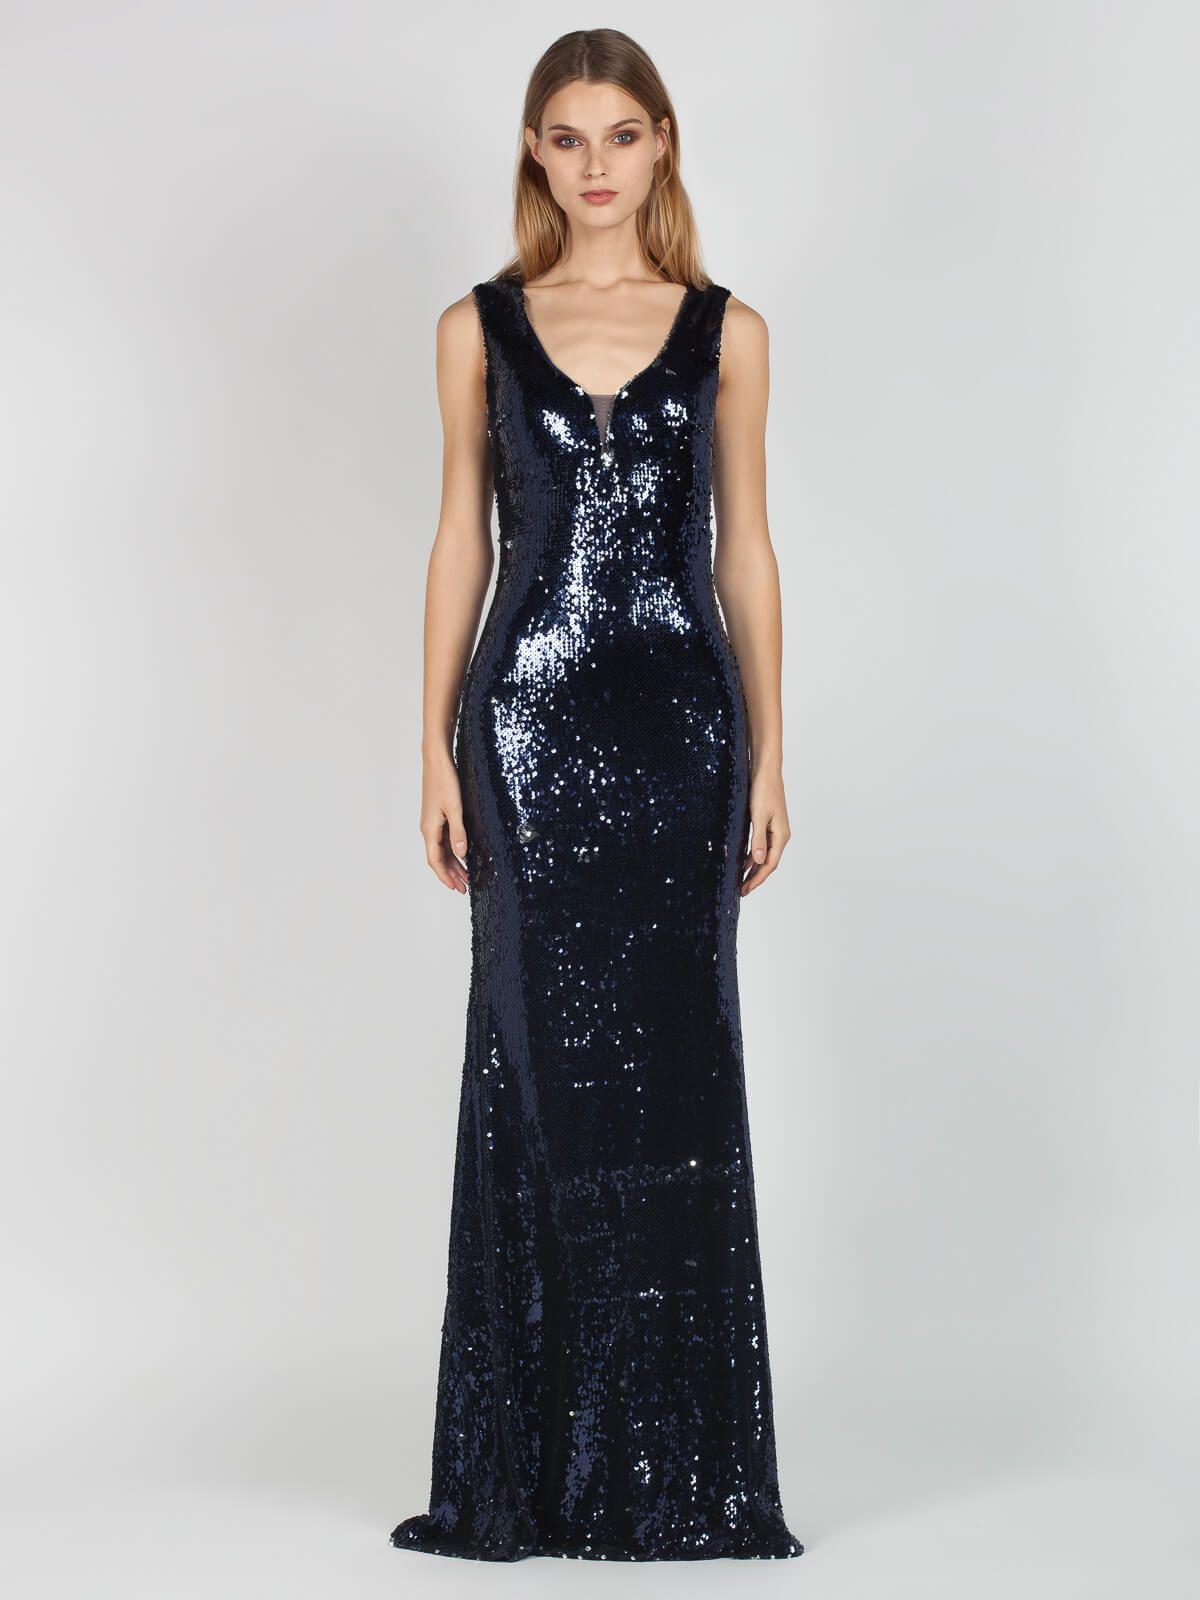 ca9186d085b5 Μάξι βραδυνό φόρεμα-τουαλέτα με παγιέτες σε σκούρο μπλε χρώμα. Η τουαλέτα  είναι αμάνικη